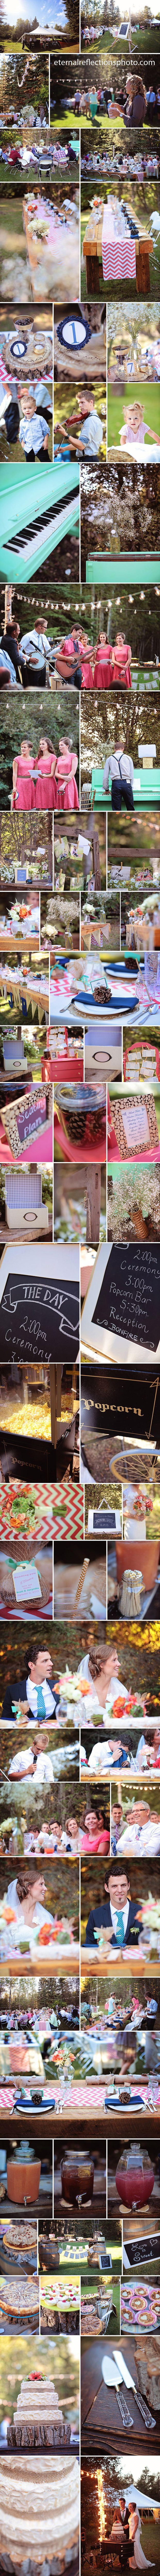 ©eternalreflectionsphoto.com Luxury Edmonton Wedding Photographers Facebook: https://www.facebook.com/pages/Eternal-Reflections-Photography/76901299044?ref=hl